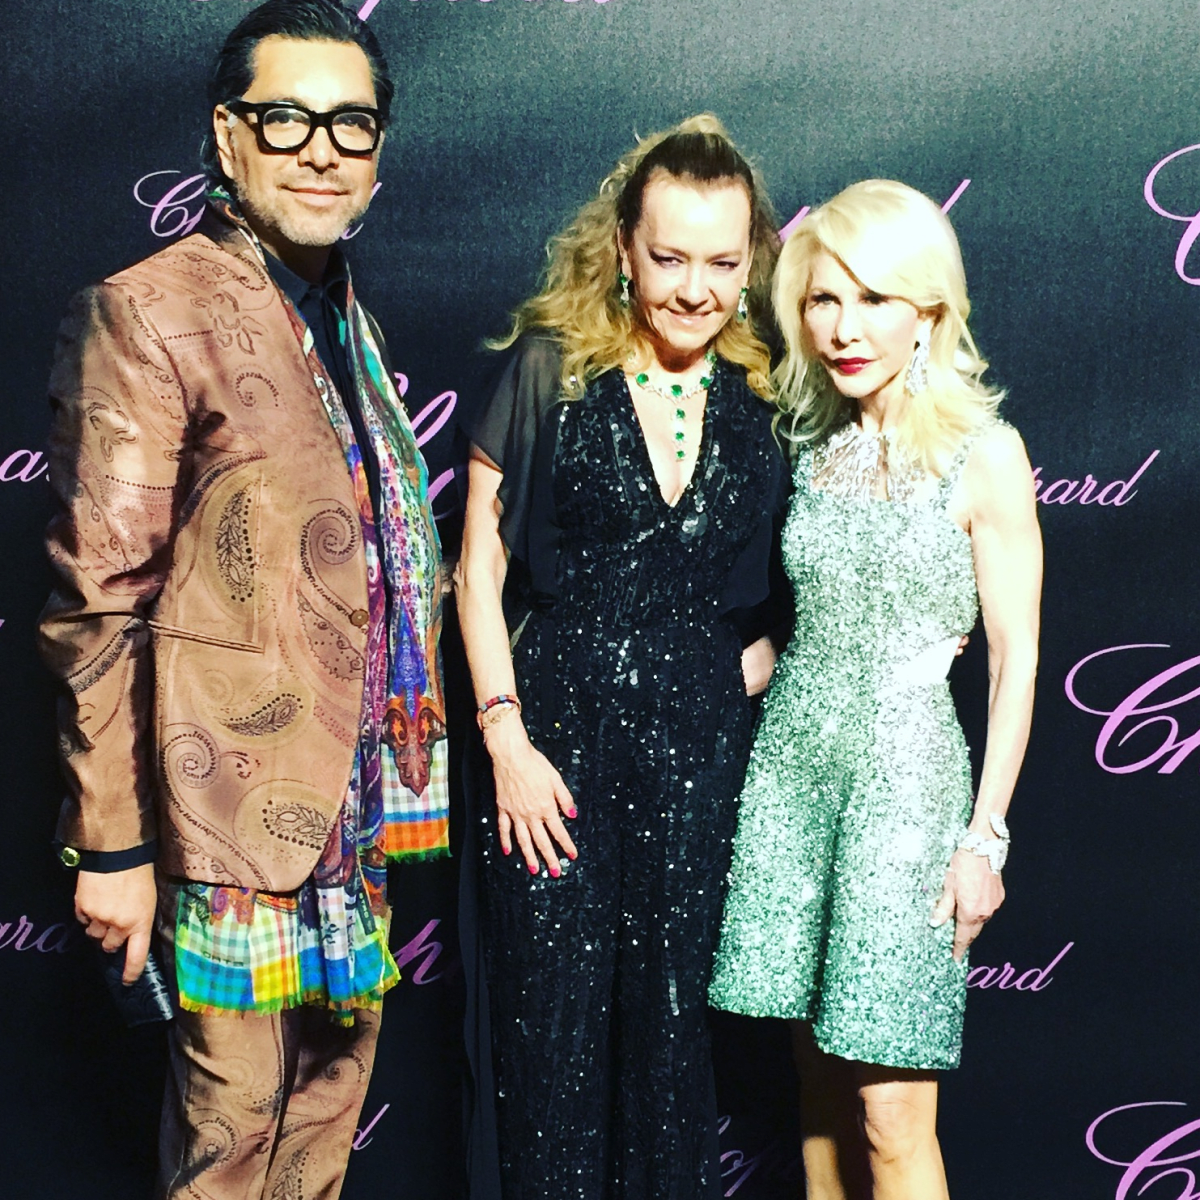 Ceron, Chopard co-president Caroline Scheufele, Diane Lokey Farb at Chopard party in Cannes